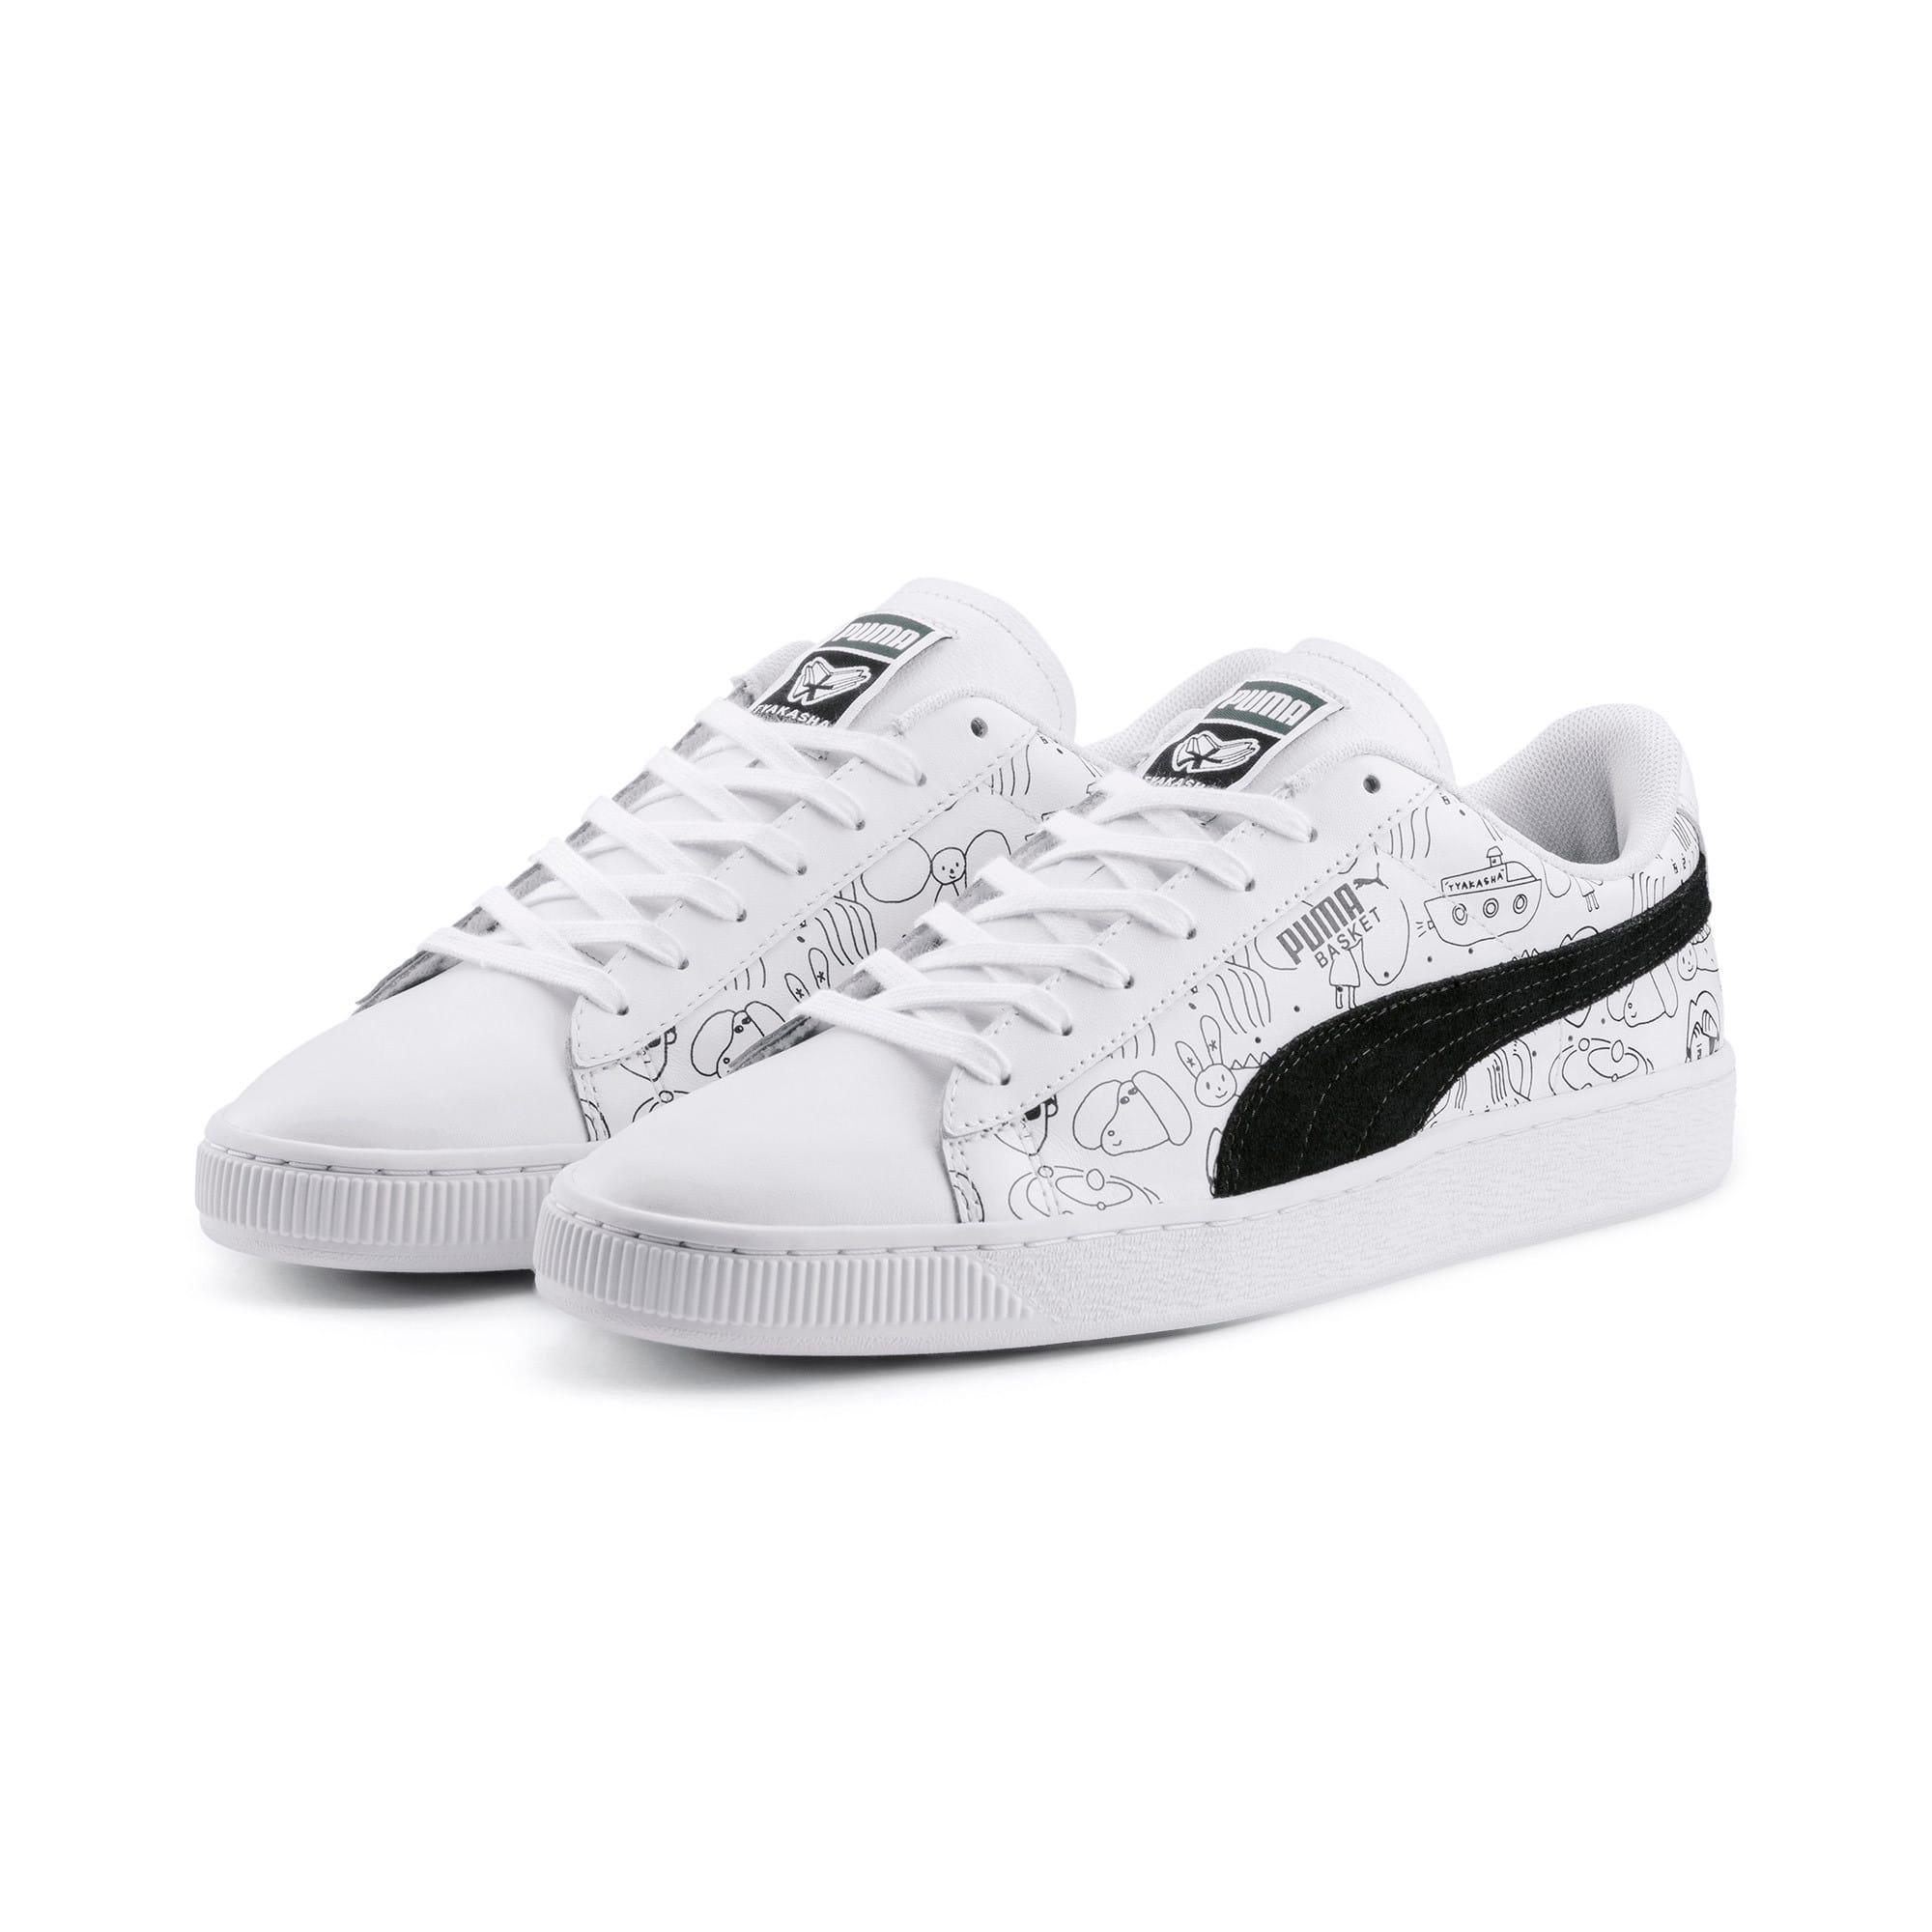 Thumbnail 4 of PUMA x TYAKASHA Basket Sneakers, Puma White-Puma Black, medium